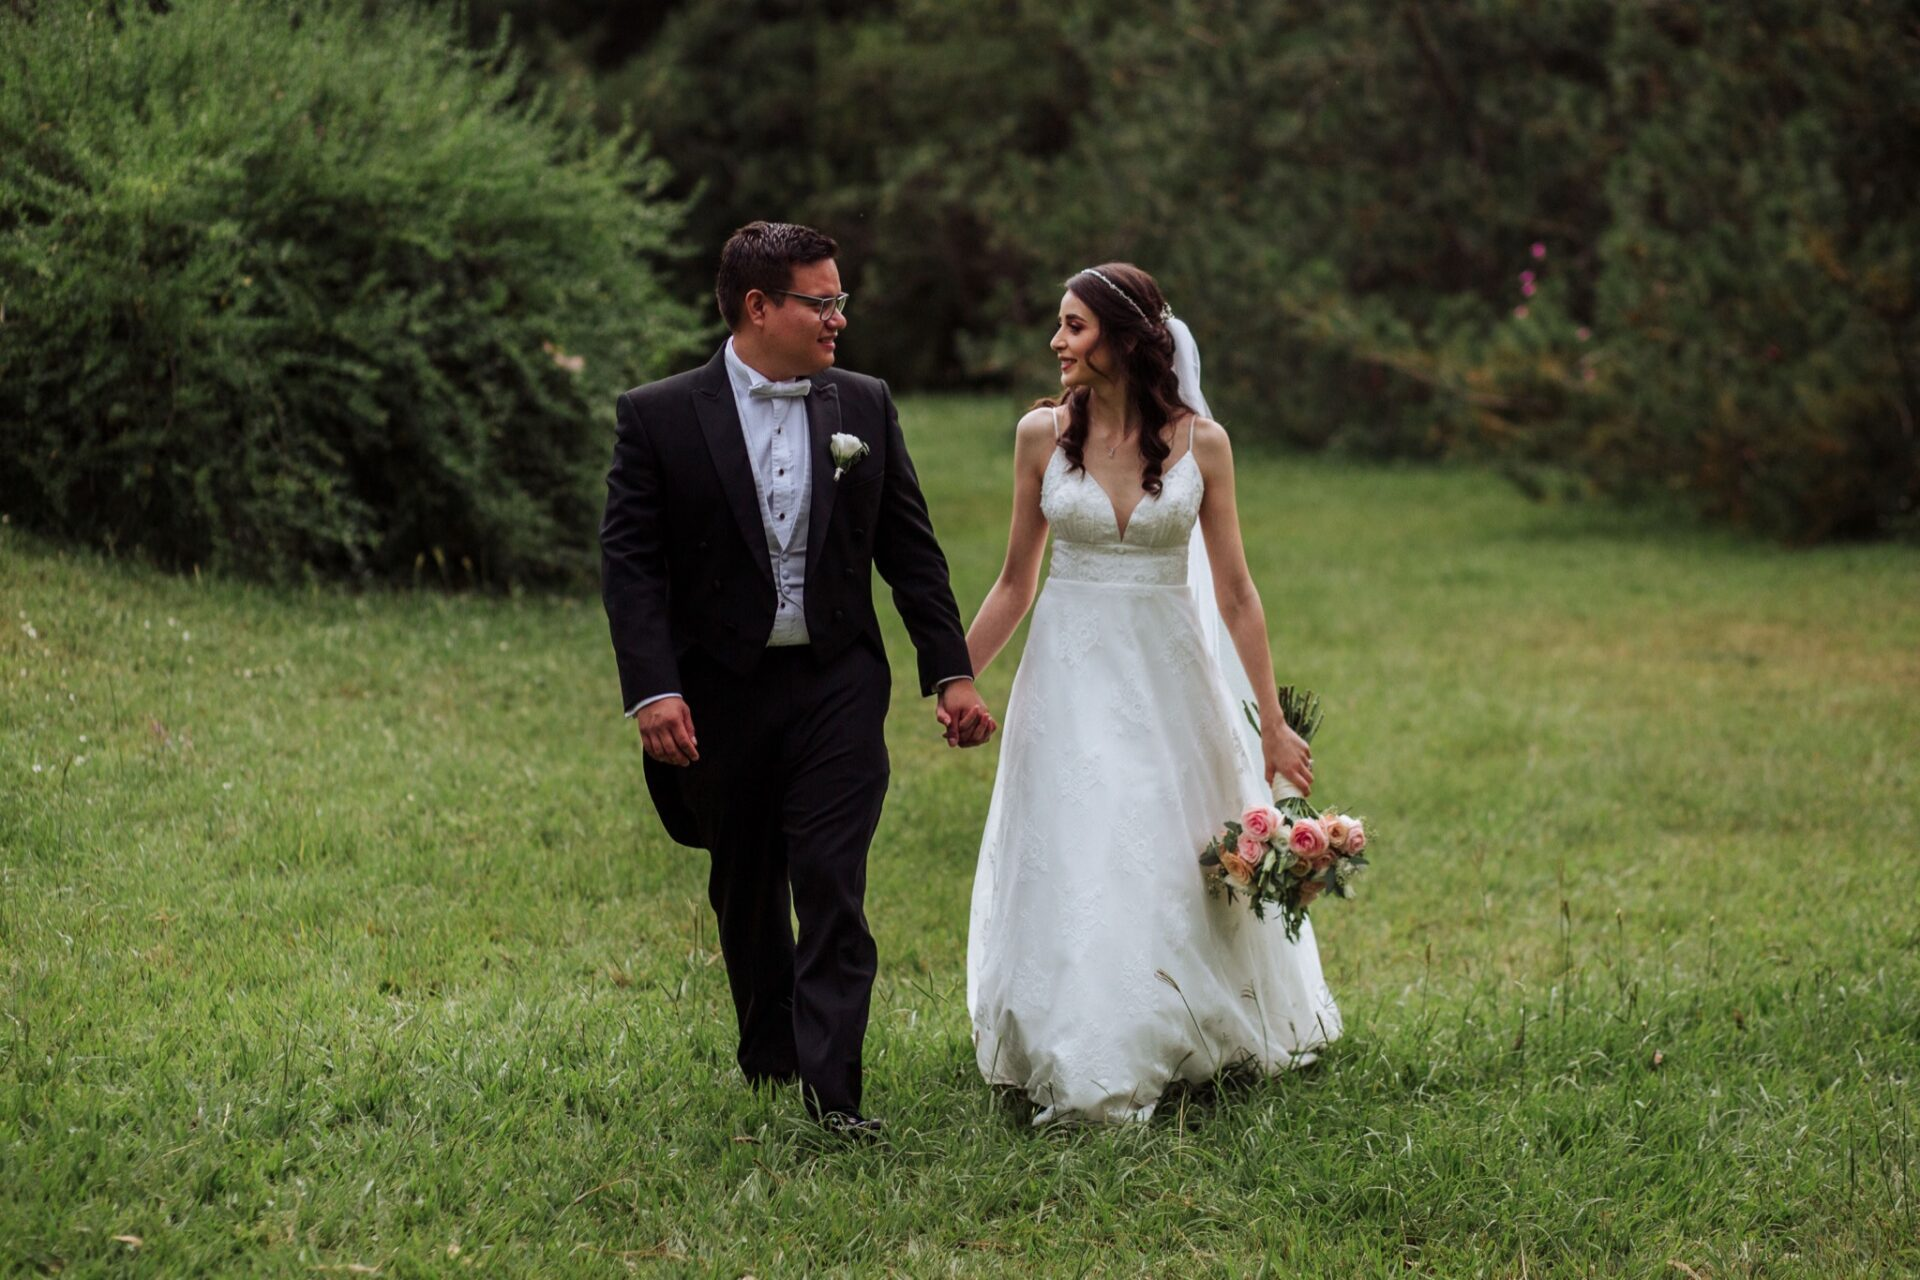 javier_noriega_fotografo_bodas_teul_zacatecas_wedding_photographer26